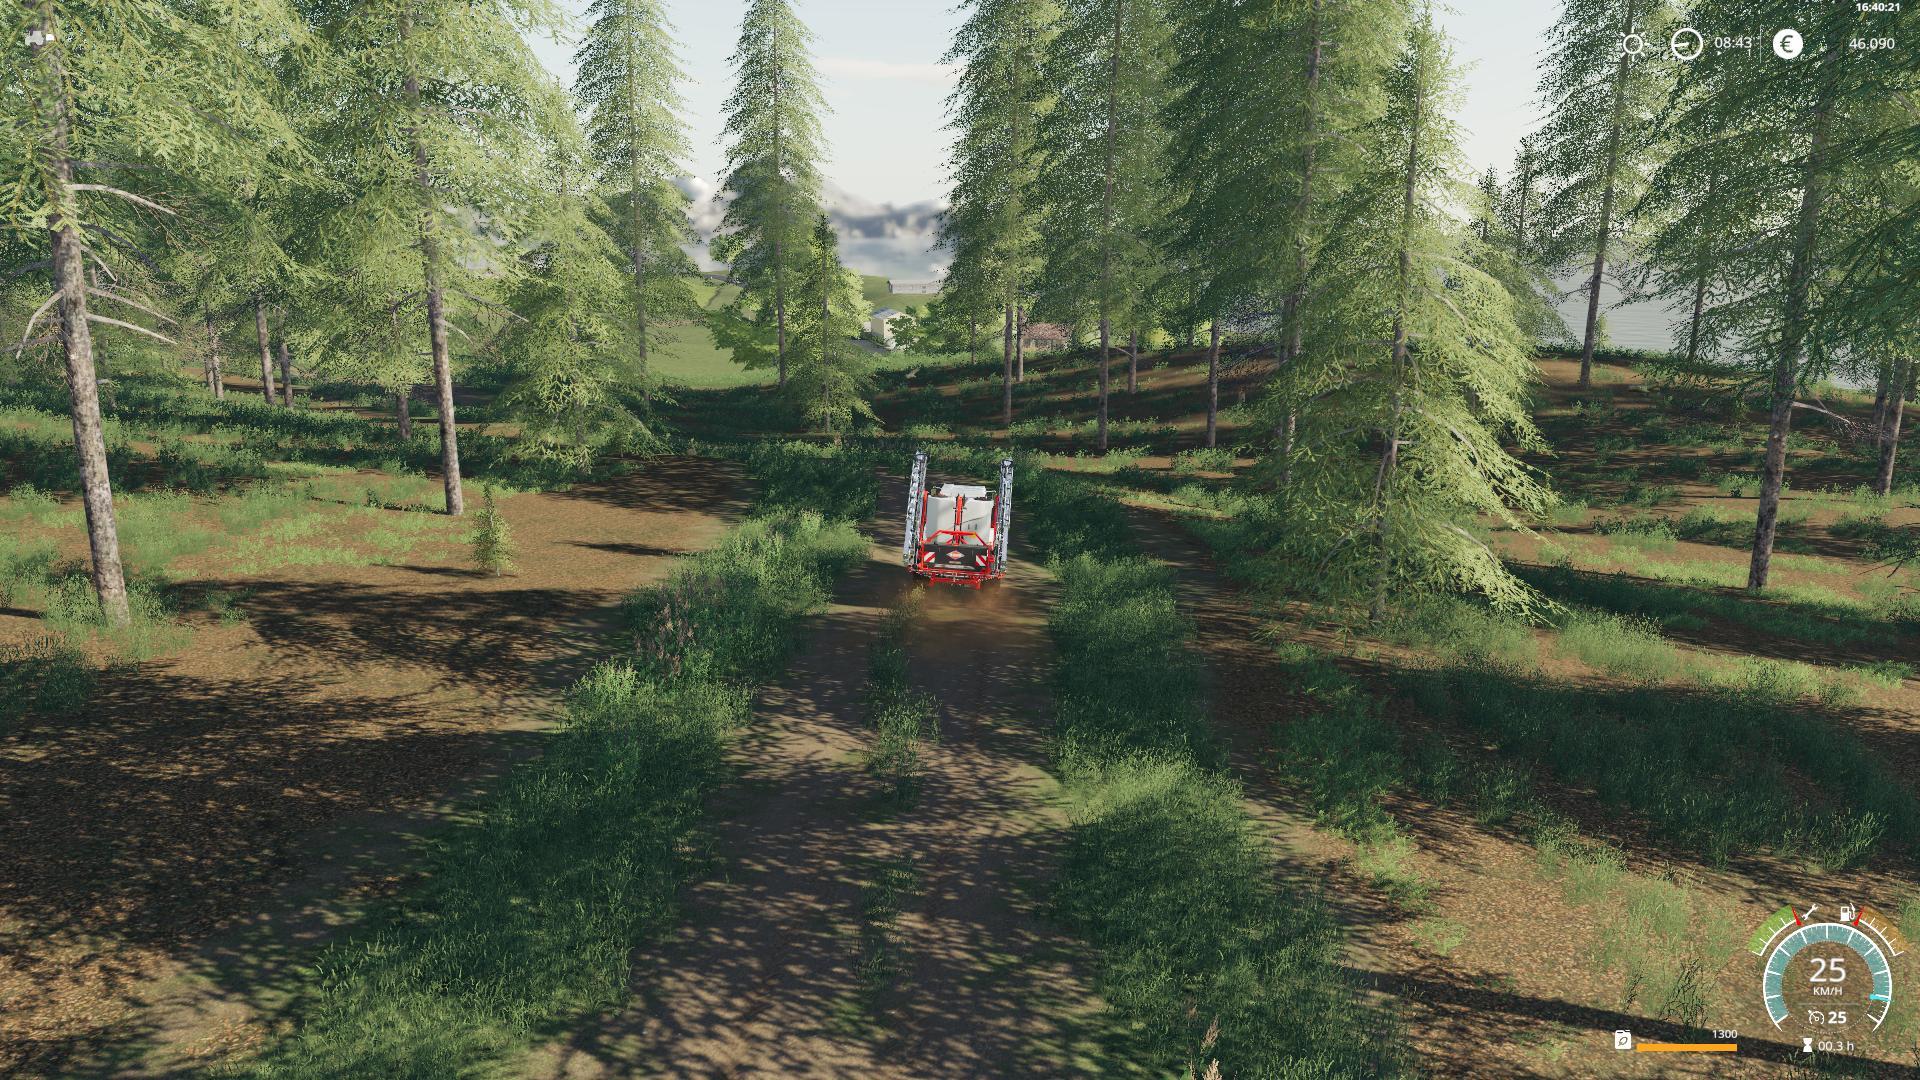 Giants Island 09 v0.0.1 BETA for LS 19 - Farming Simulator ...